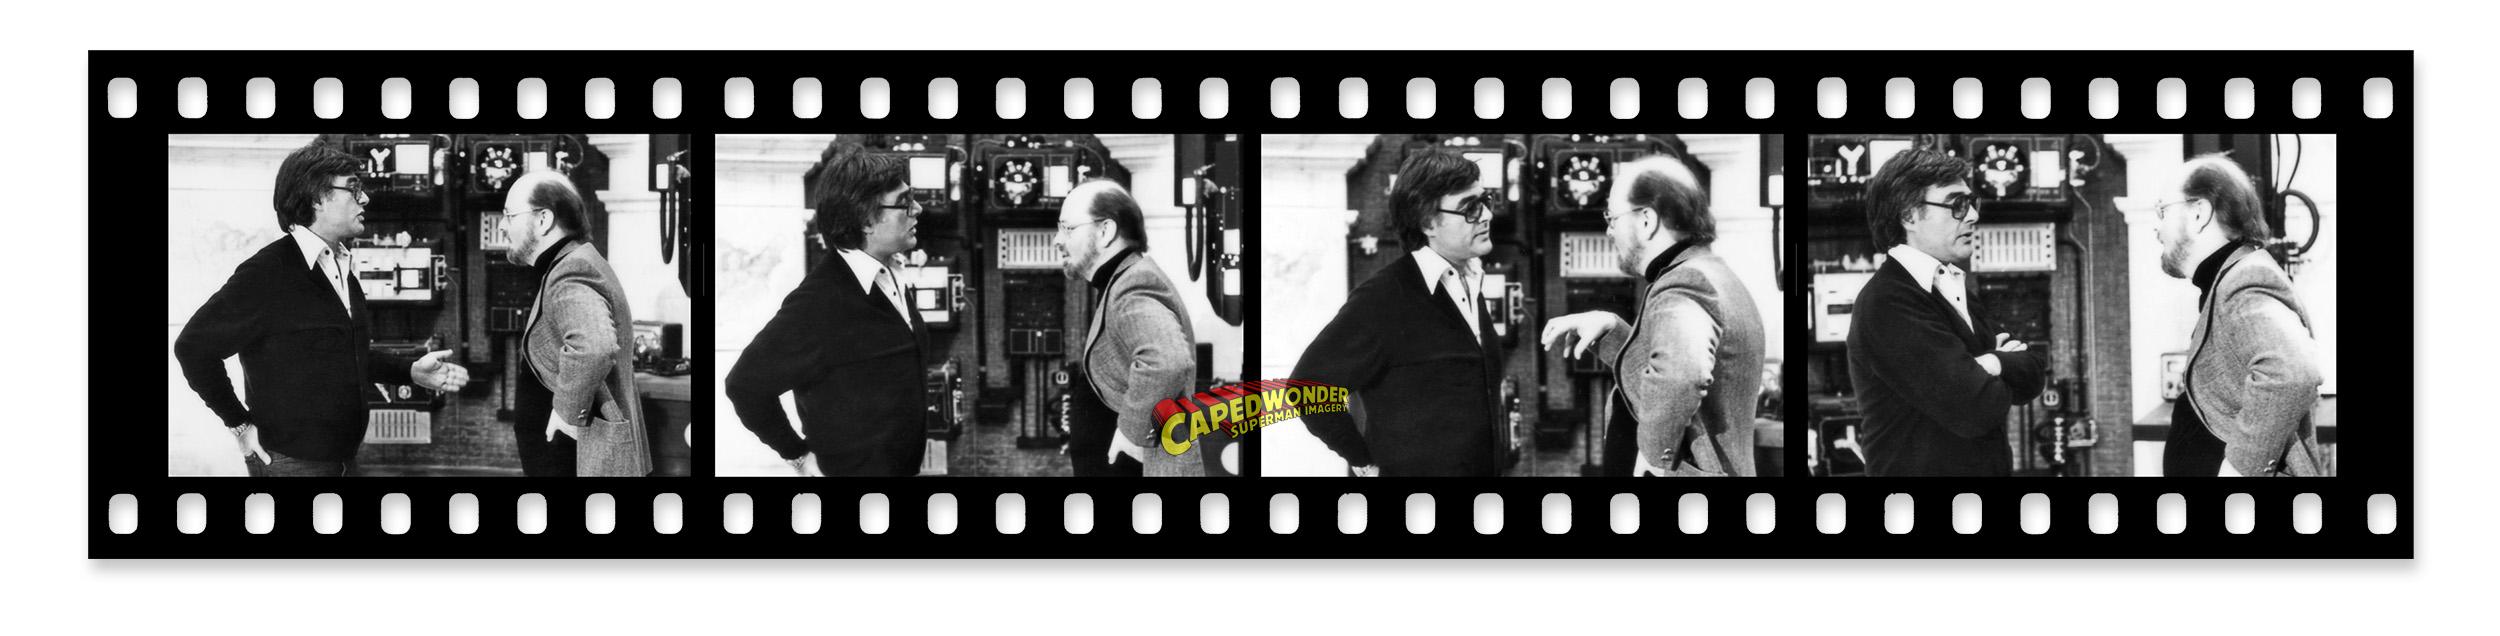 CW-STM-lair-Donner-Williams-filmstrip